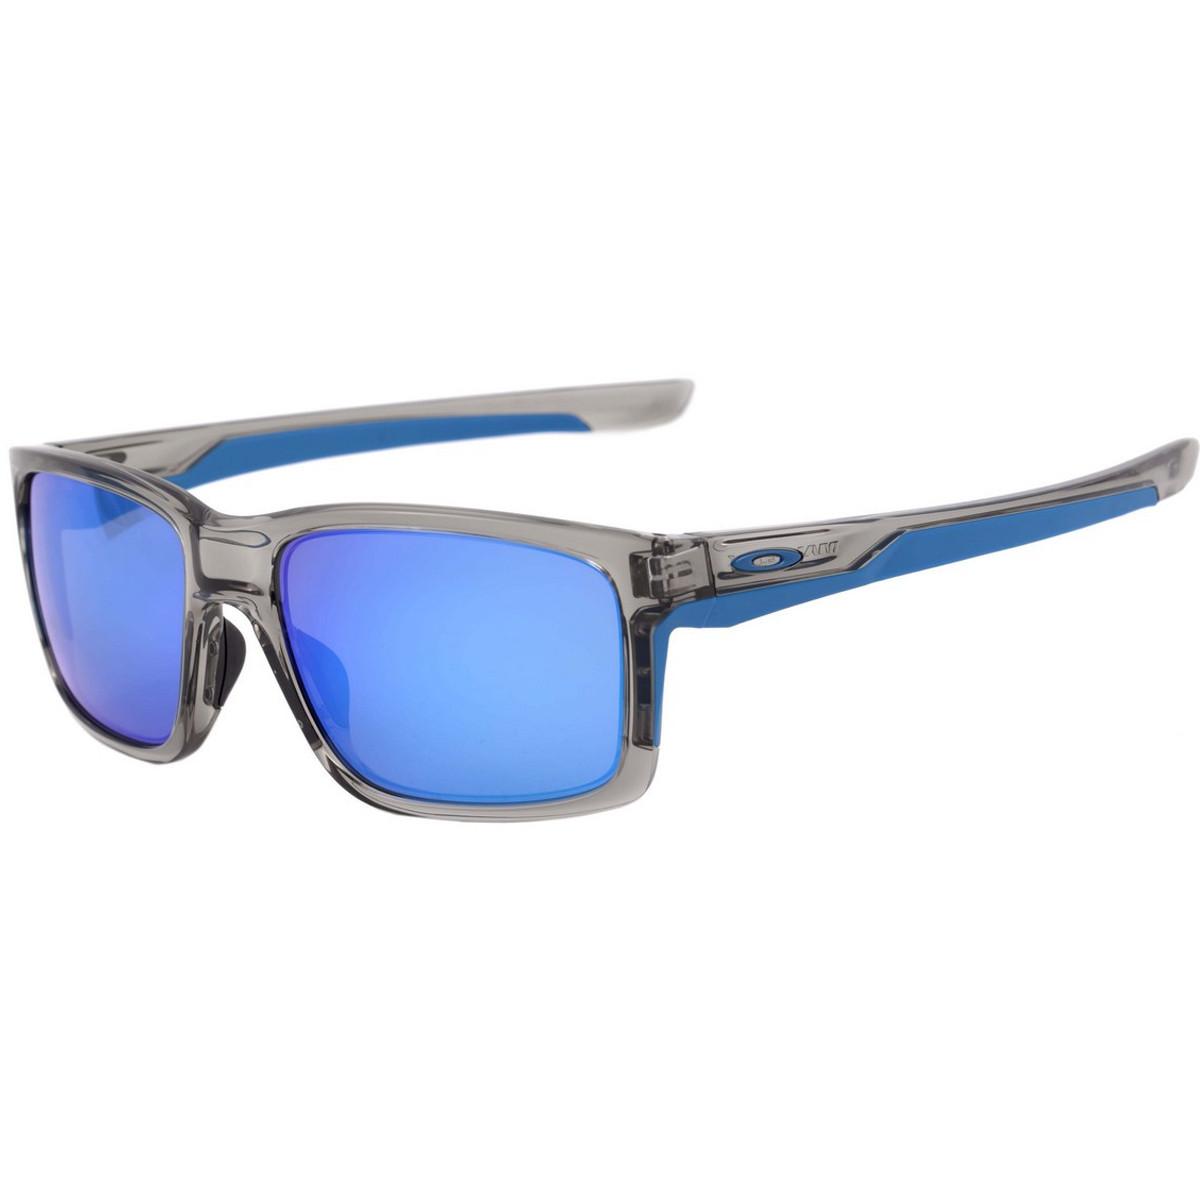 a87fc06342720 Óculos Oakley Mainlink Grey Ink  Lente Sapphire Iridium ref OO9264-03